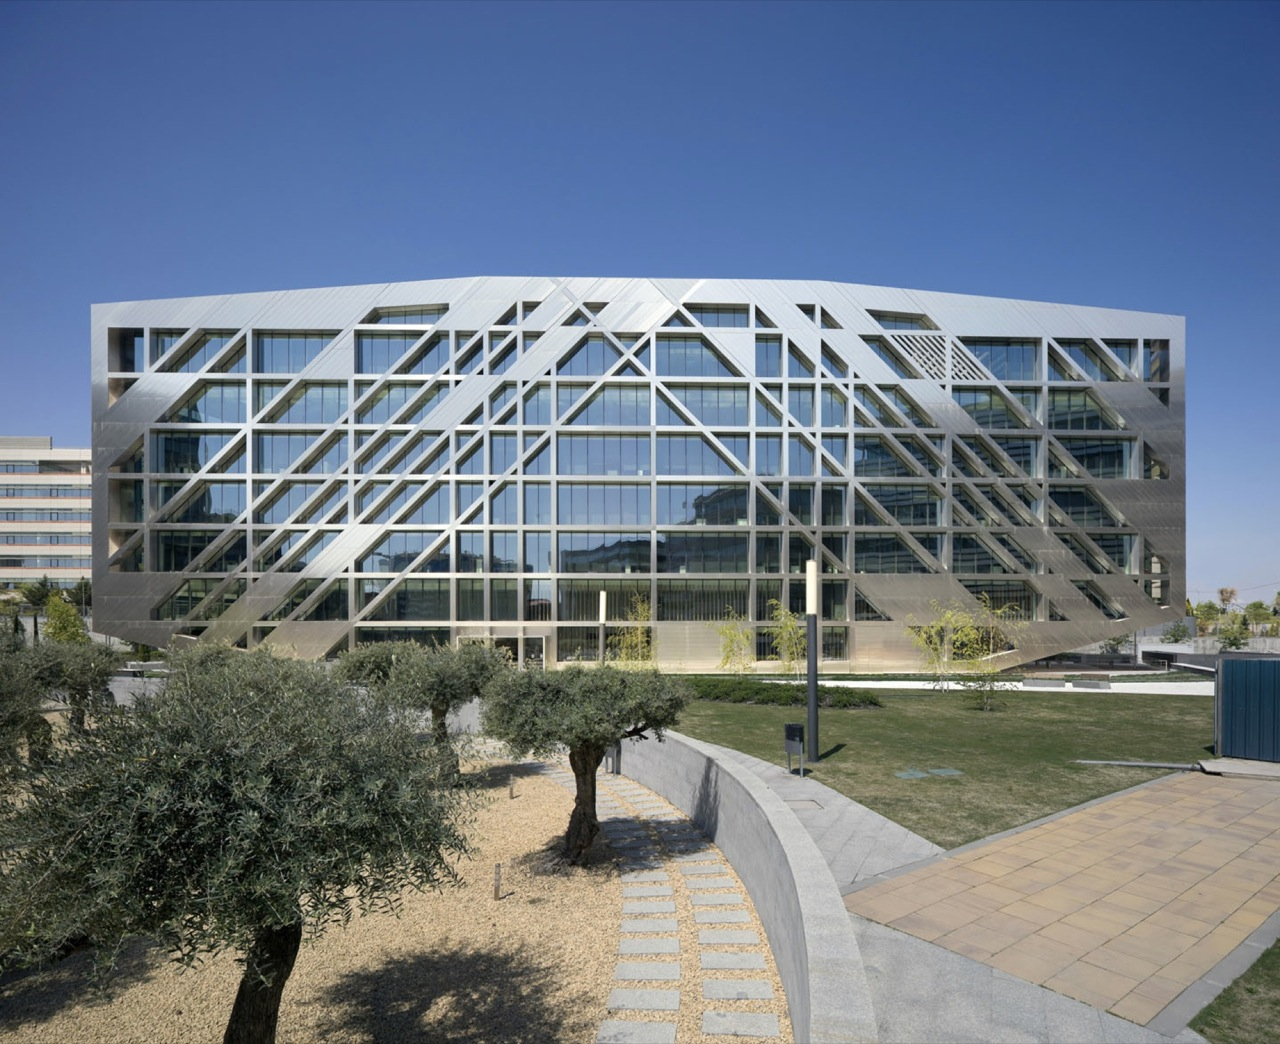 A.M.A. Headquarters / Rafael de La-Hoz Arquitectos, © Duccio Malagamba